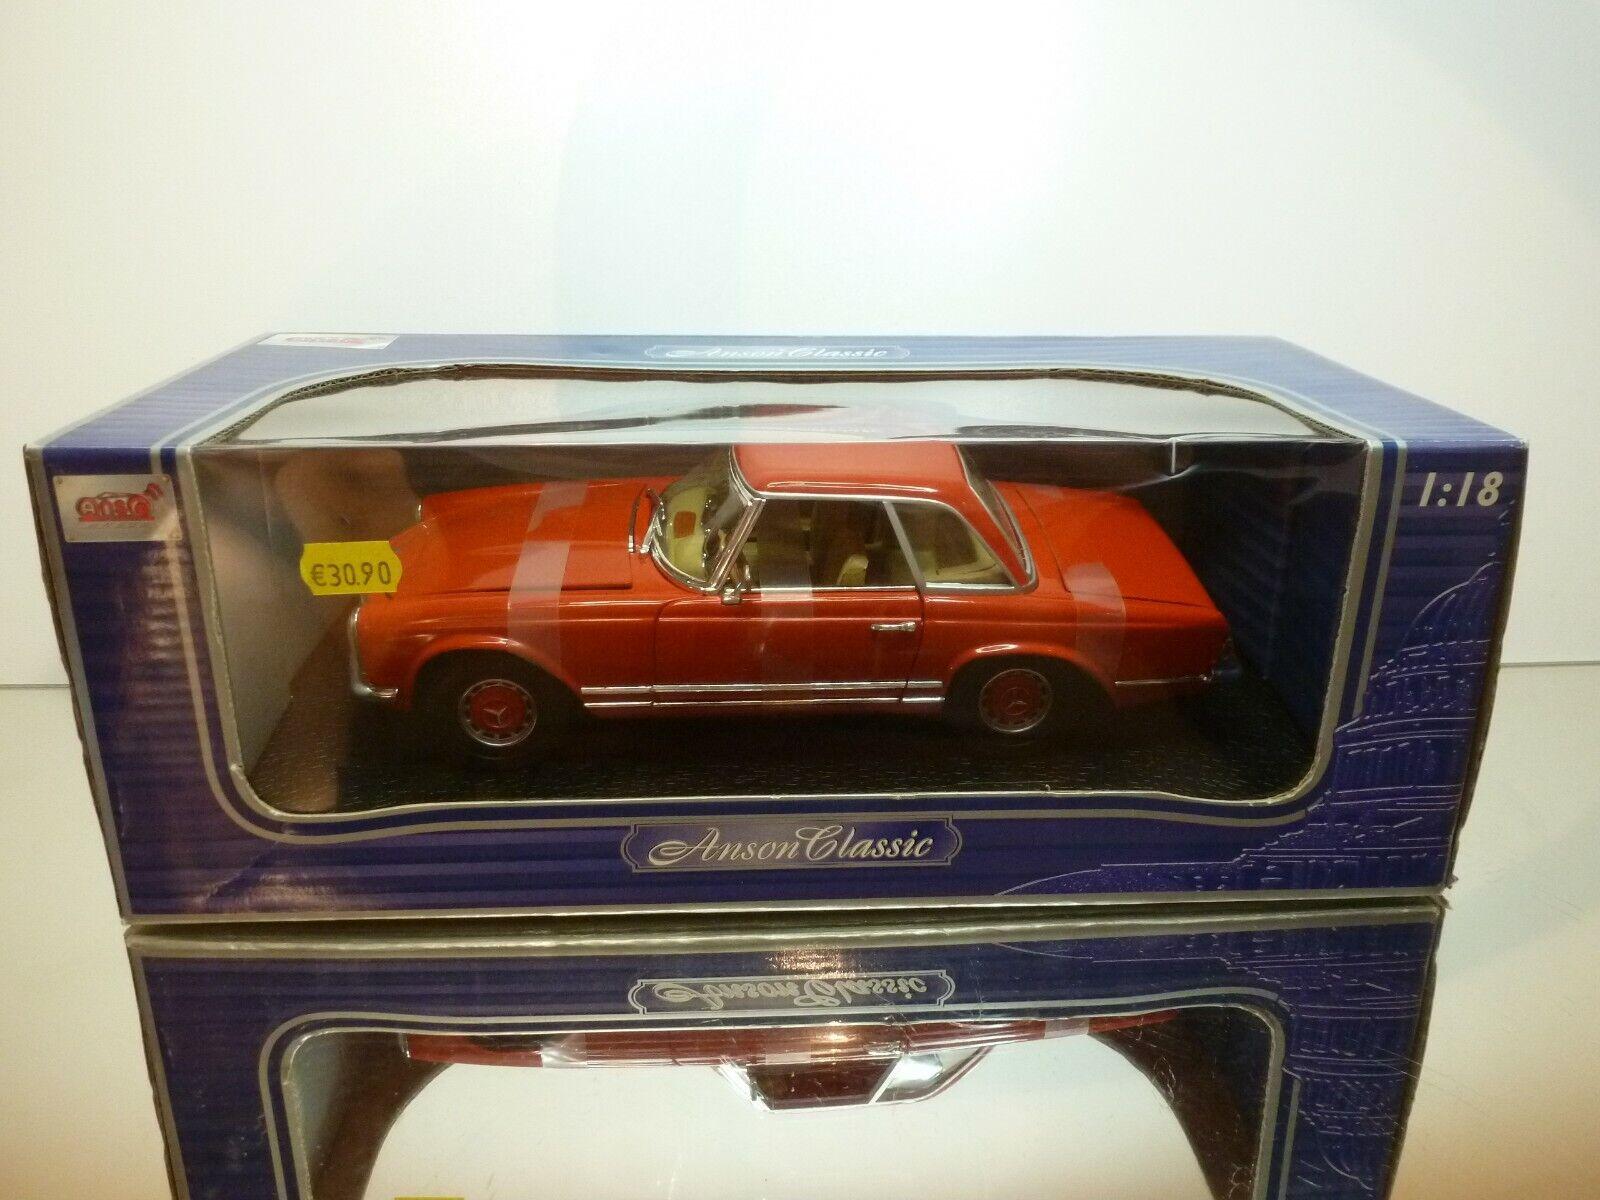 ANSON 30389  MERCEDES BENZ 280 SL - RED 1 18 - EXCELLENT IN BOX